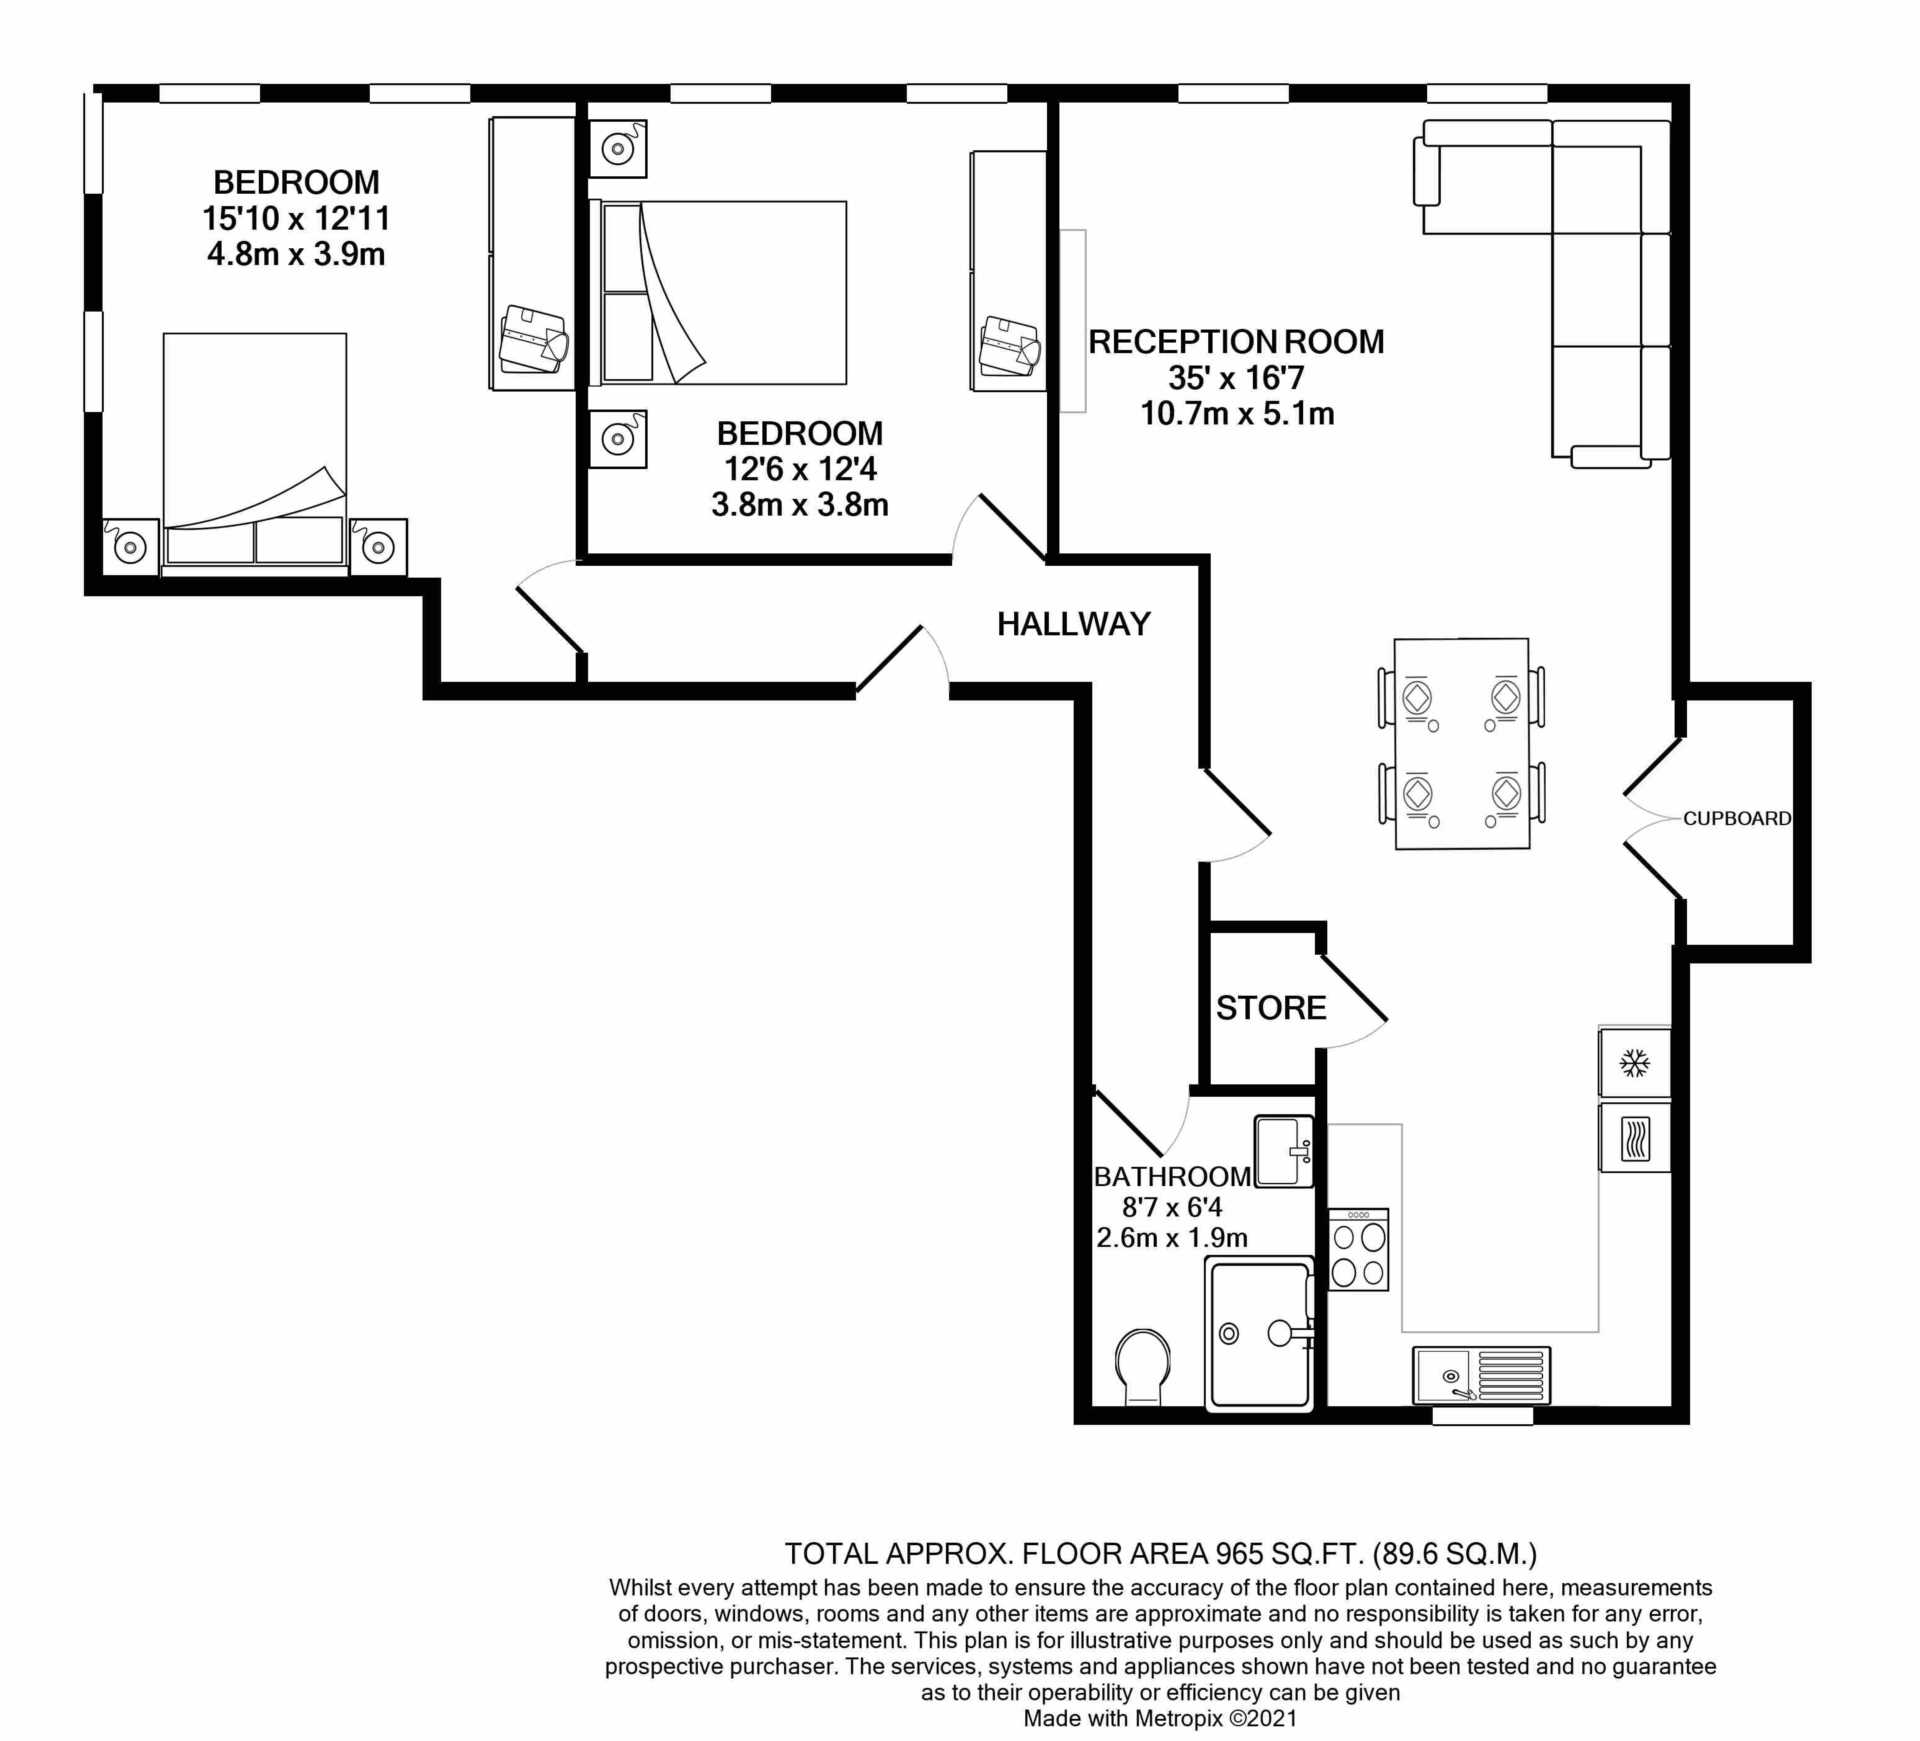 Flat 6, Waterloo Apartments, Image 14